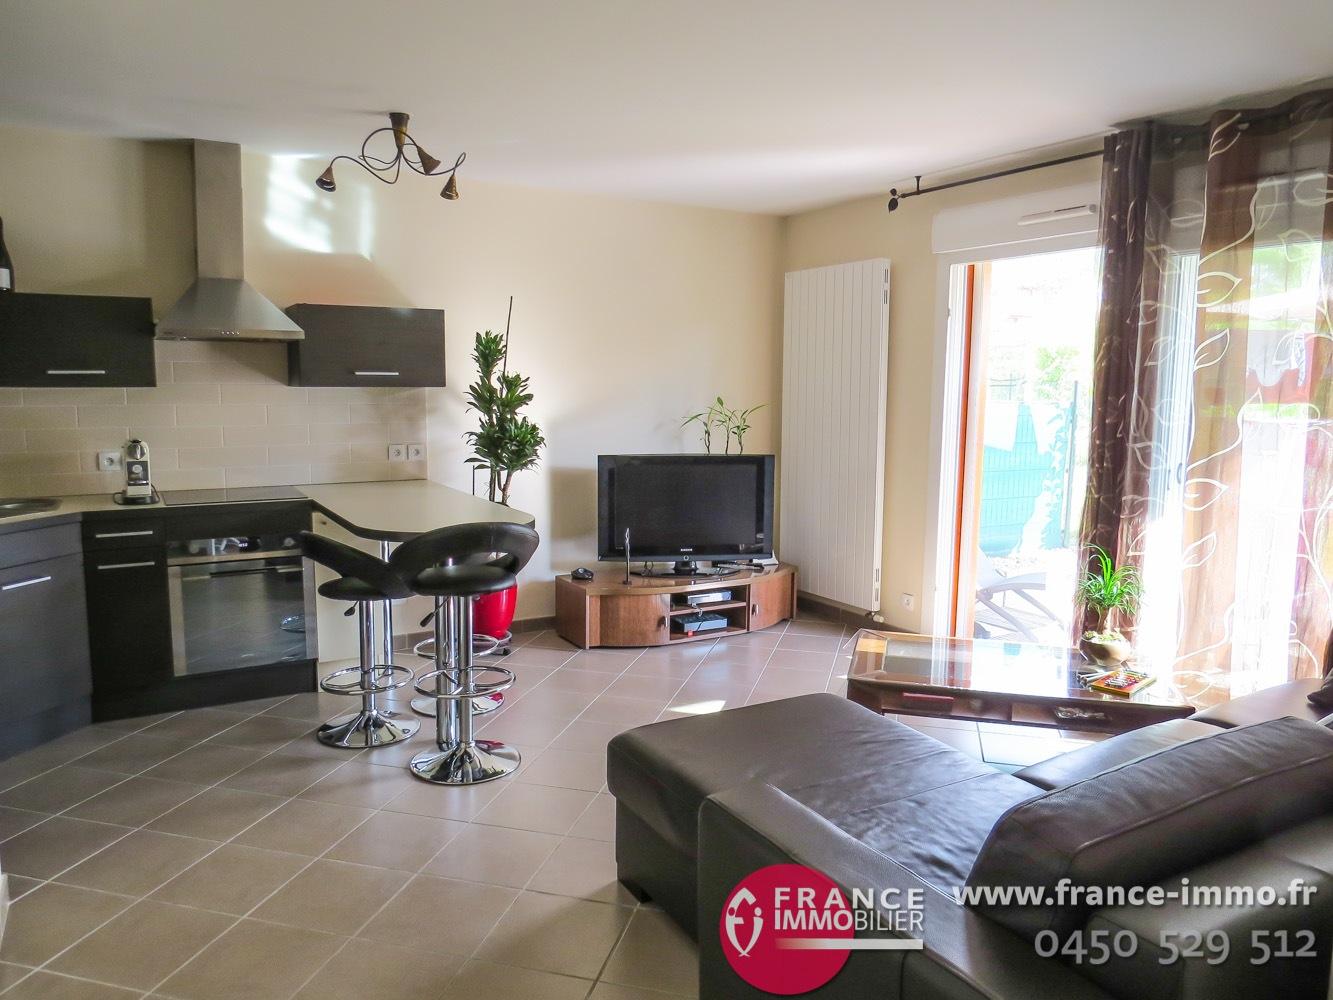 vente appartement vieugy 74600 40m avec 2 pi ce s dont 1 chambre s immo replay. Black Bedroom Furniture Sets. Home Design Ideas